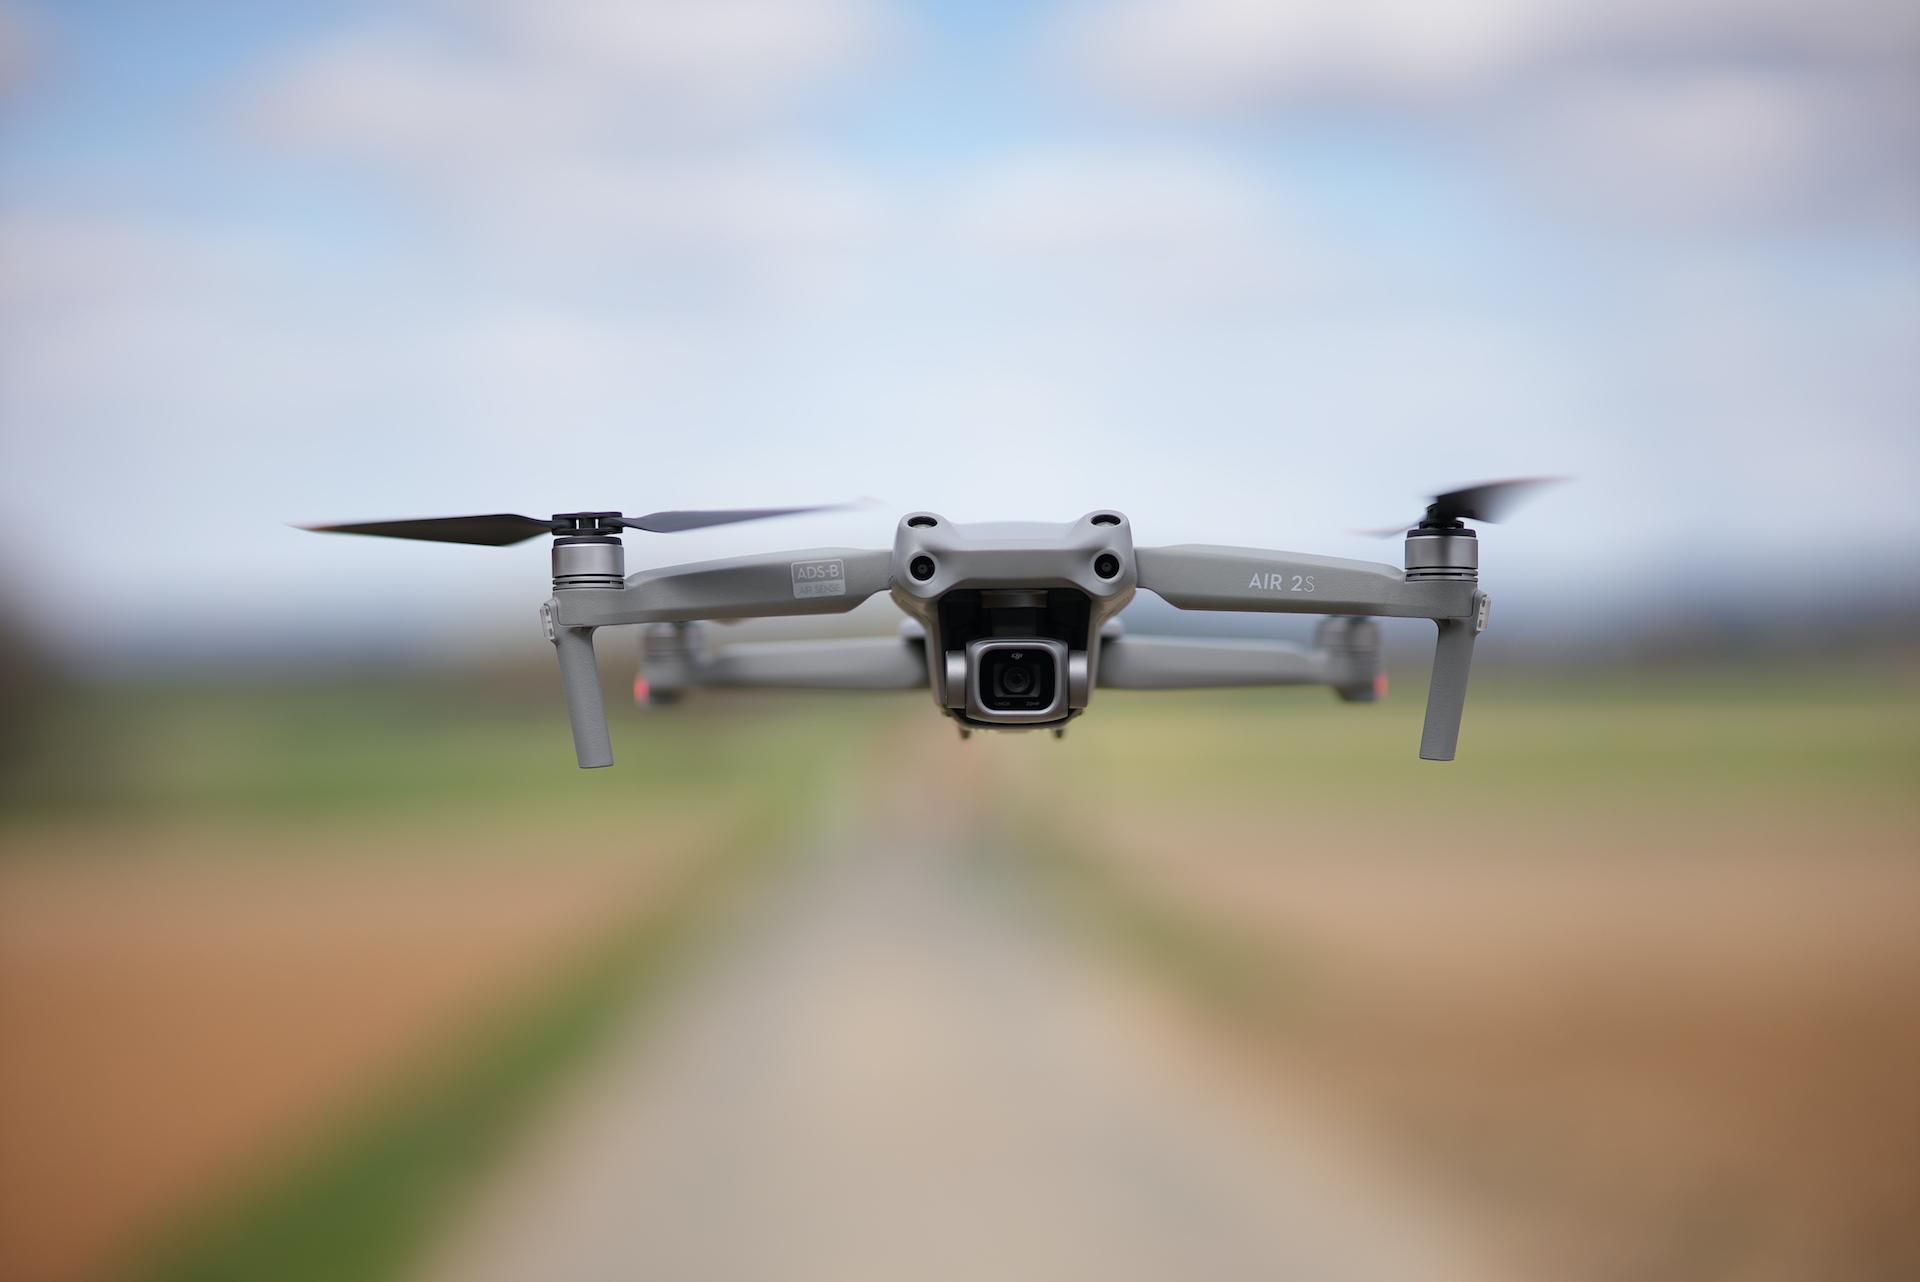 DJI Air 2 S Drohne von DJI vorgestellt, DJI Air 2 S Plakette